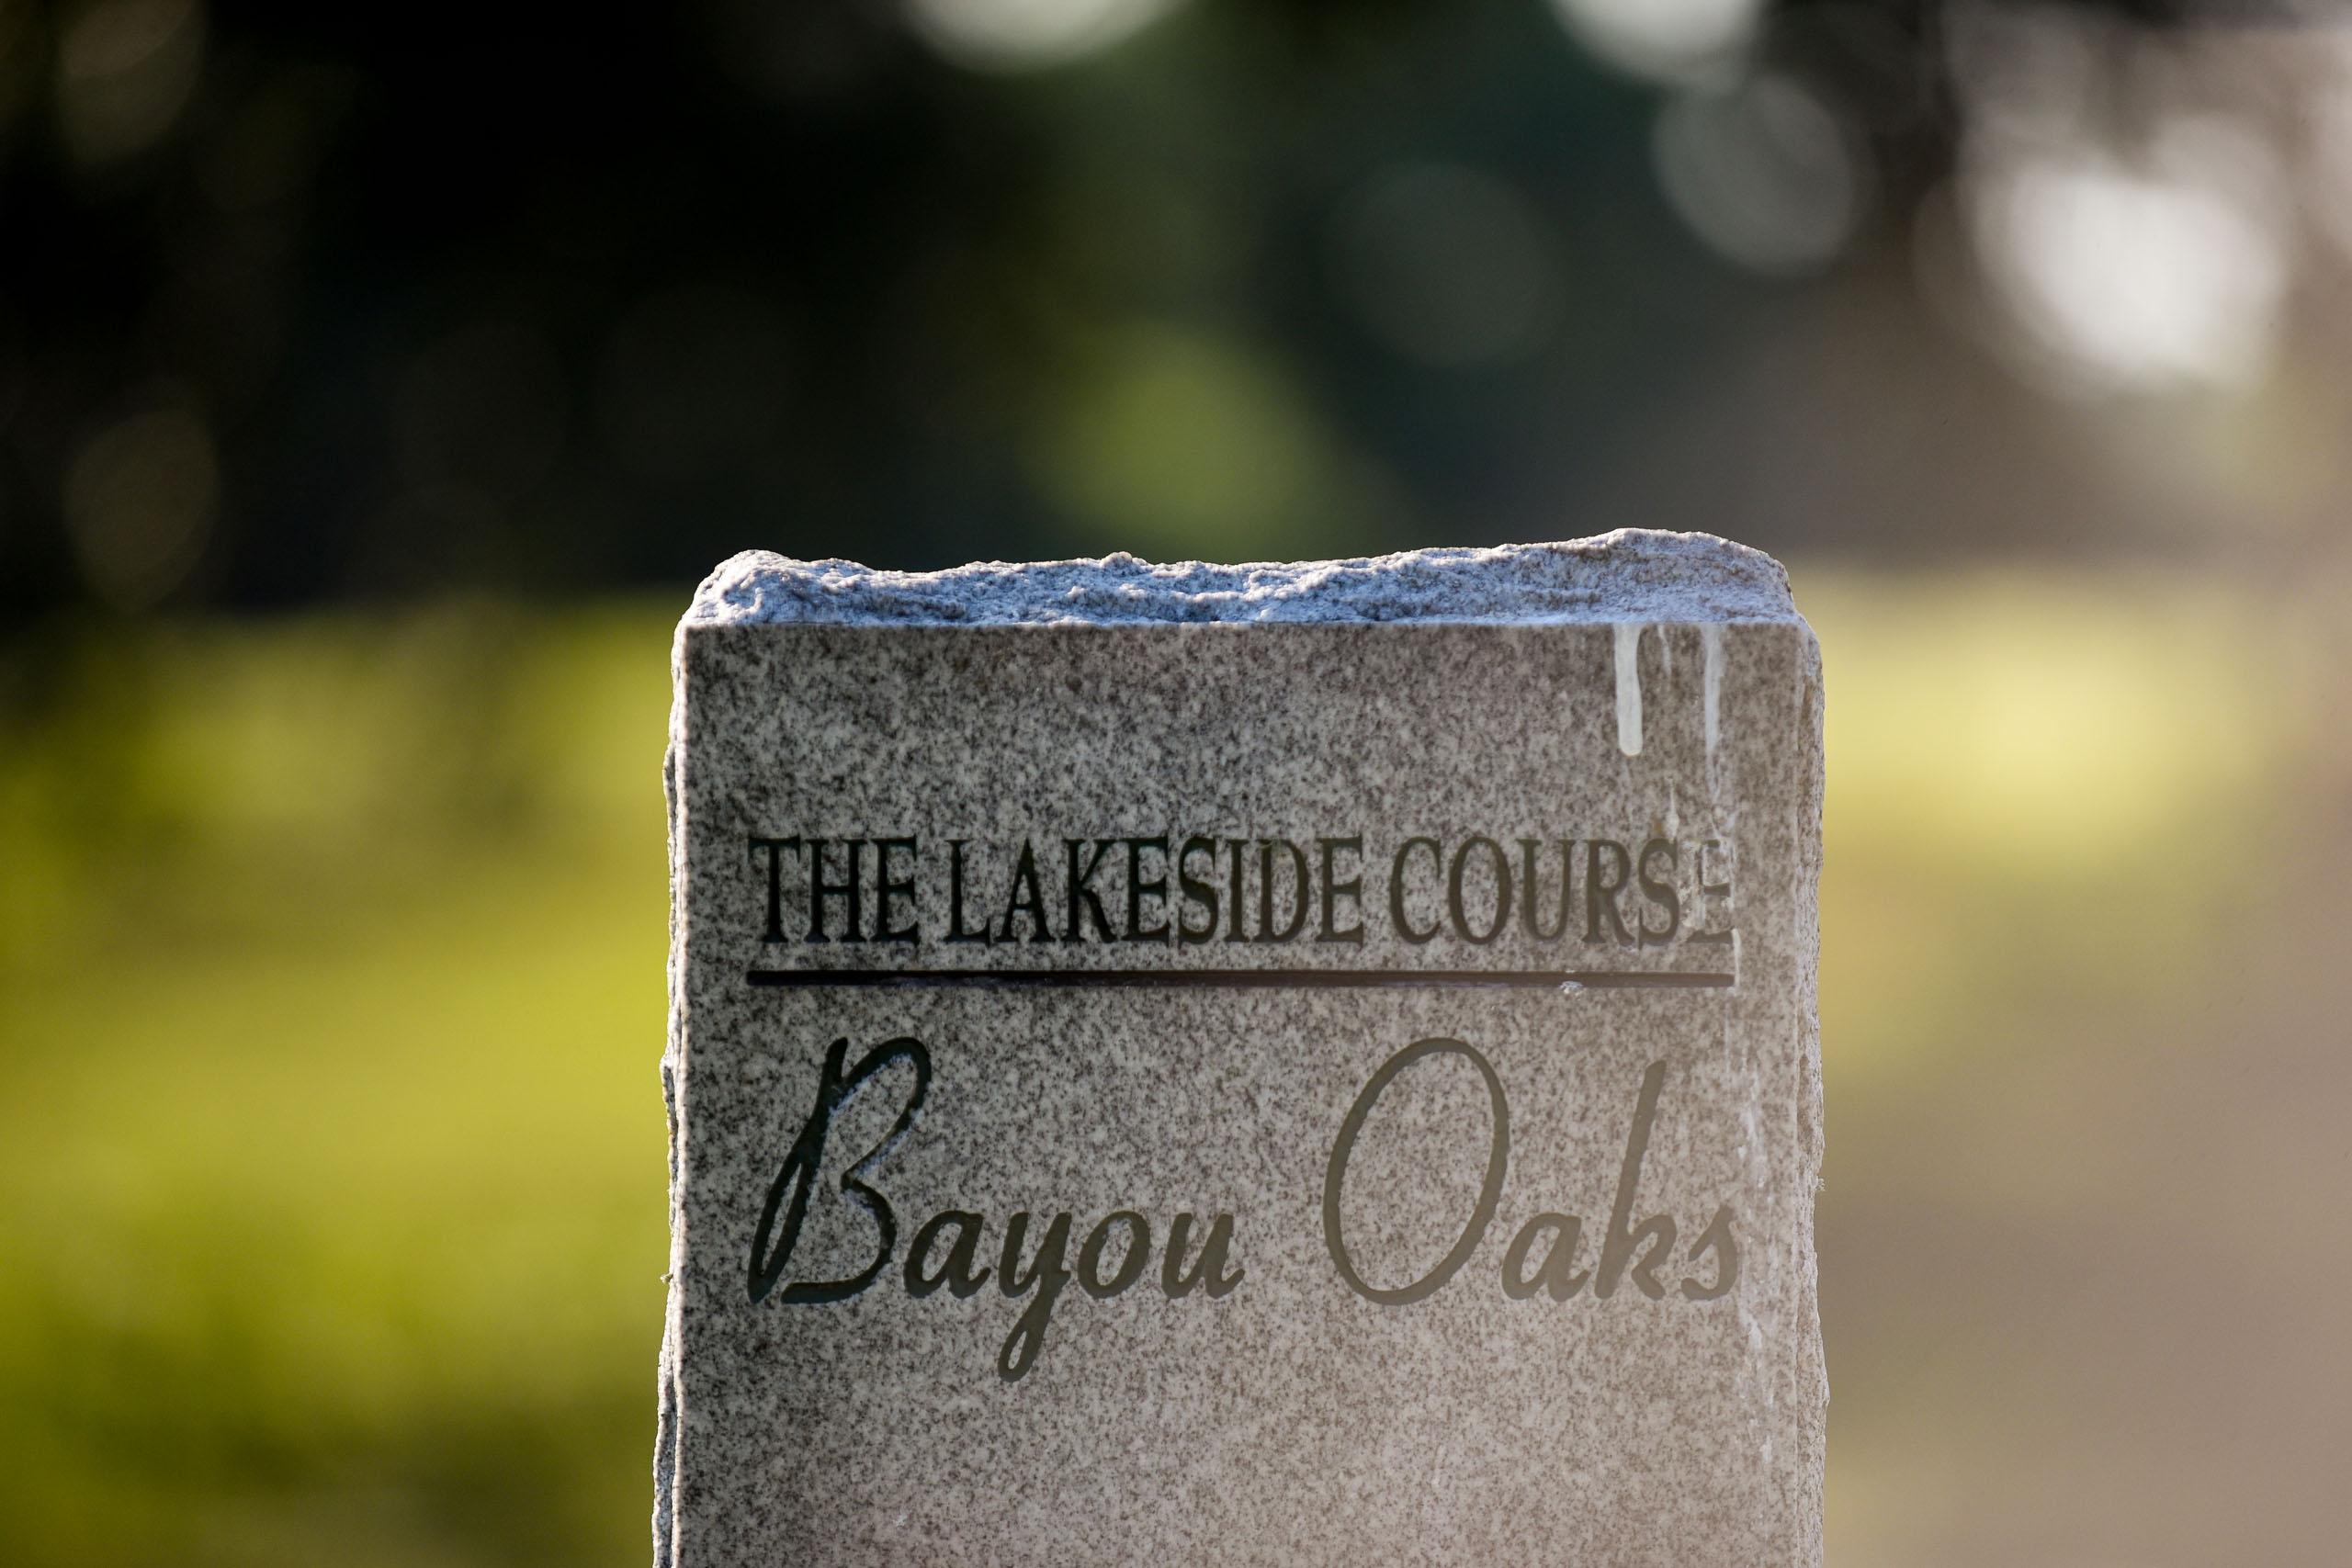 Bayou Oaks, Lakeside Course. Photo by Ryan Young